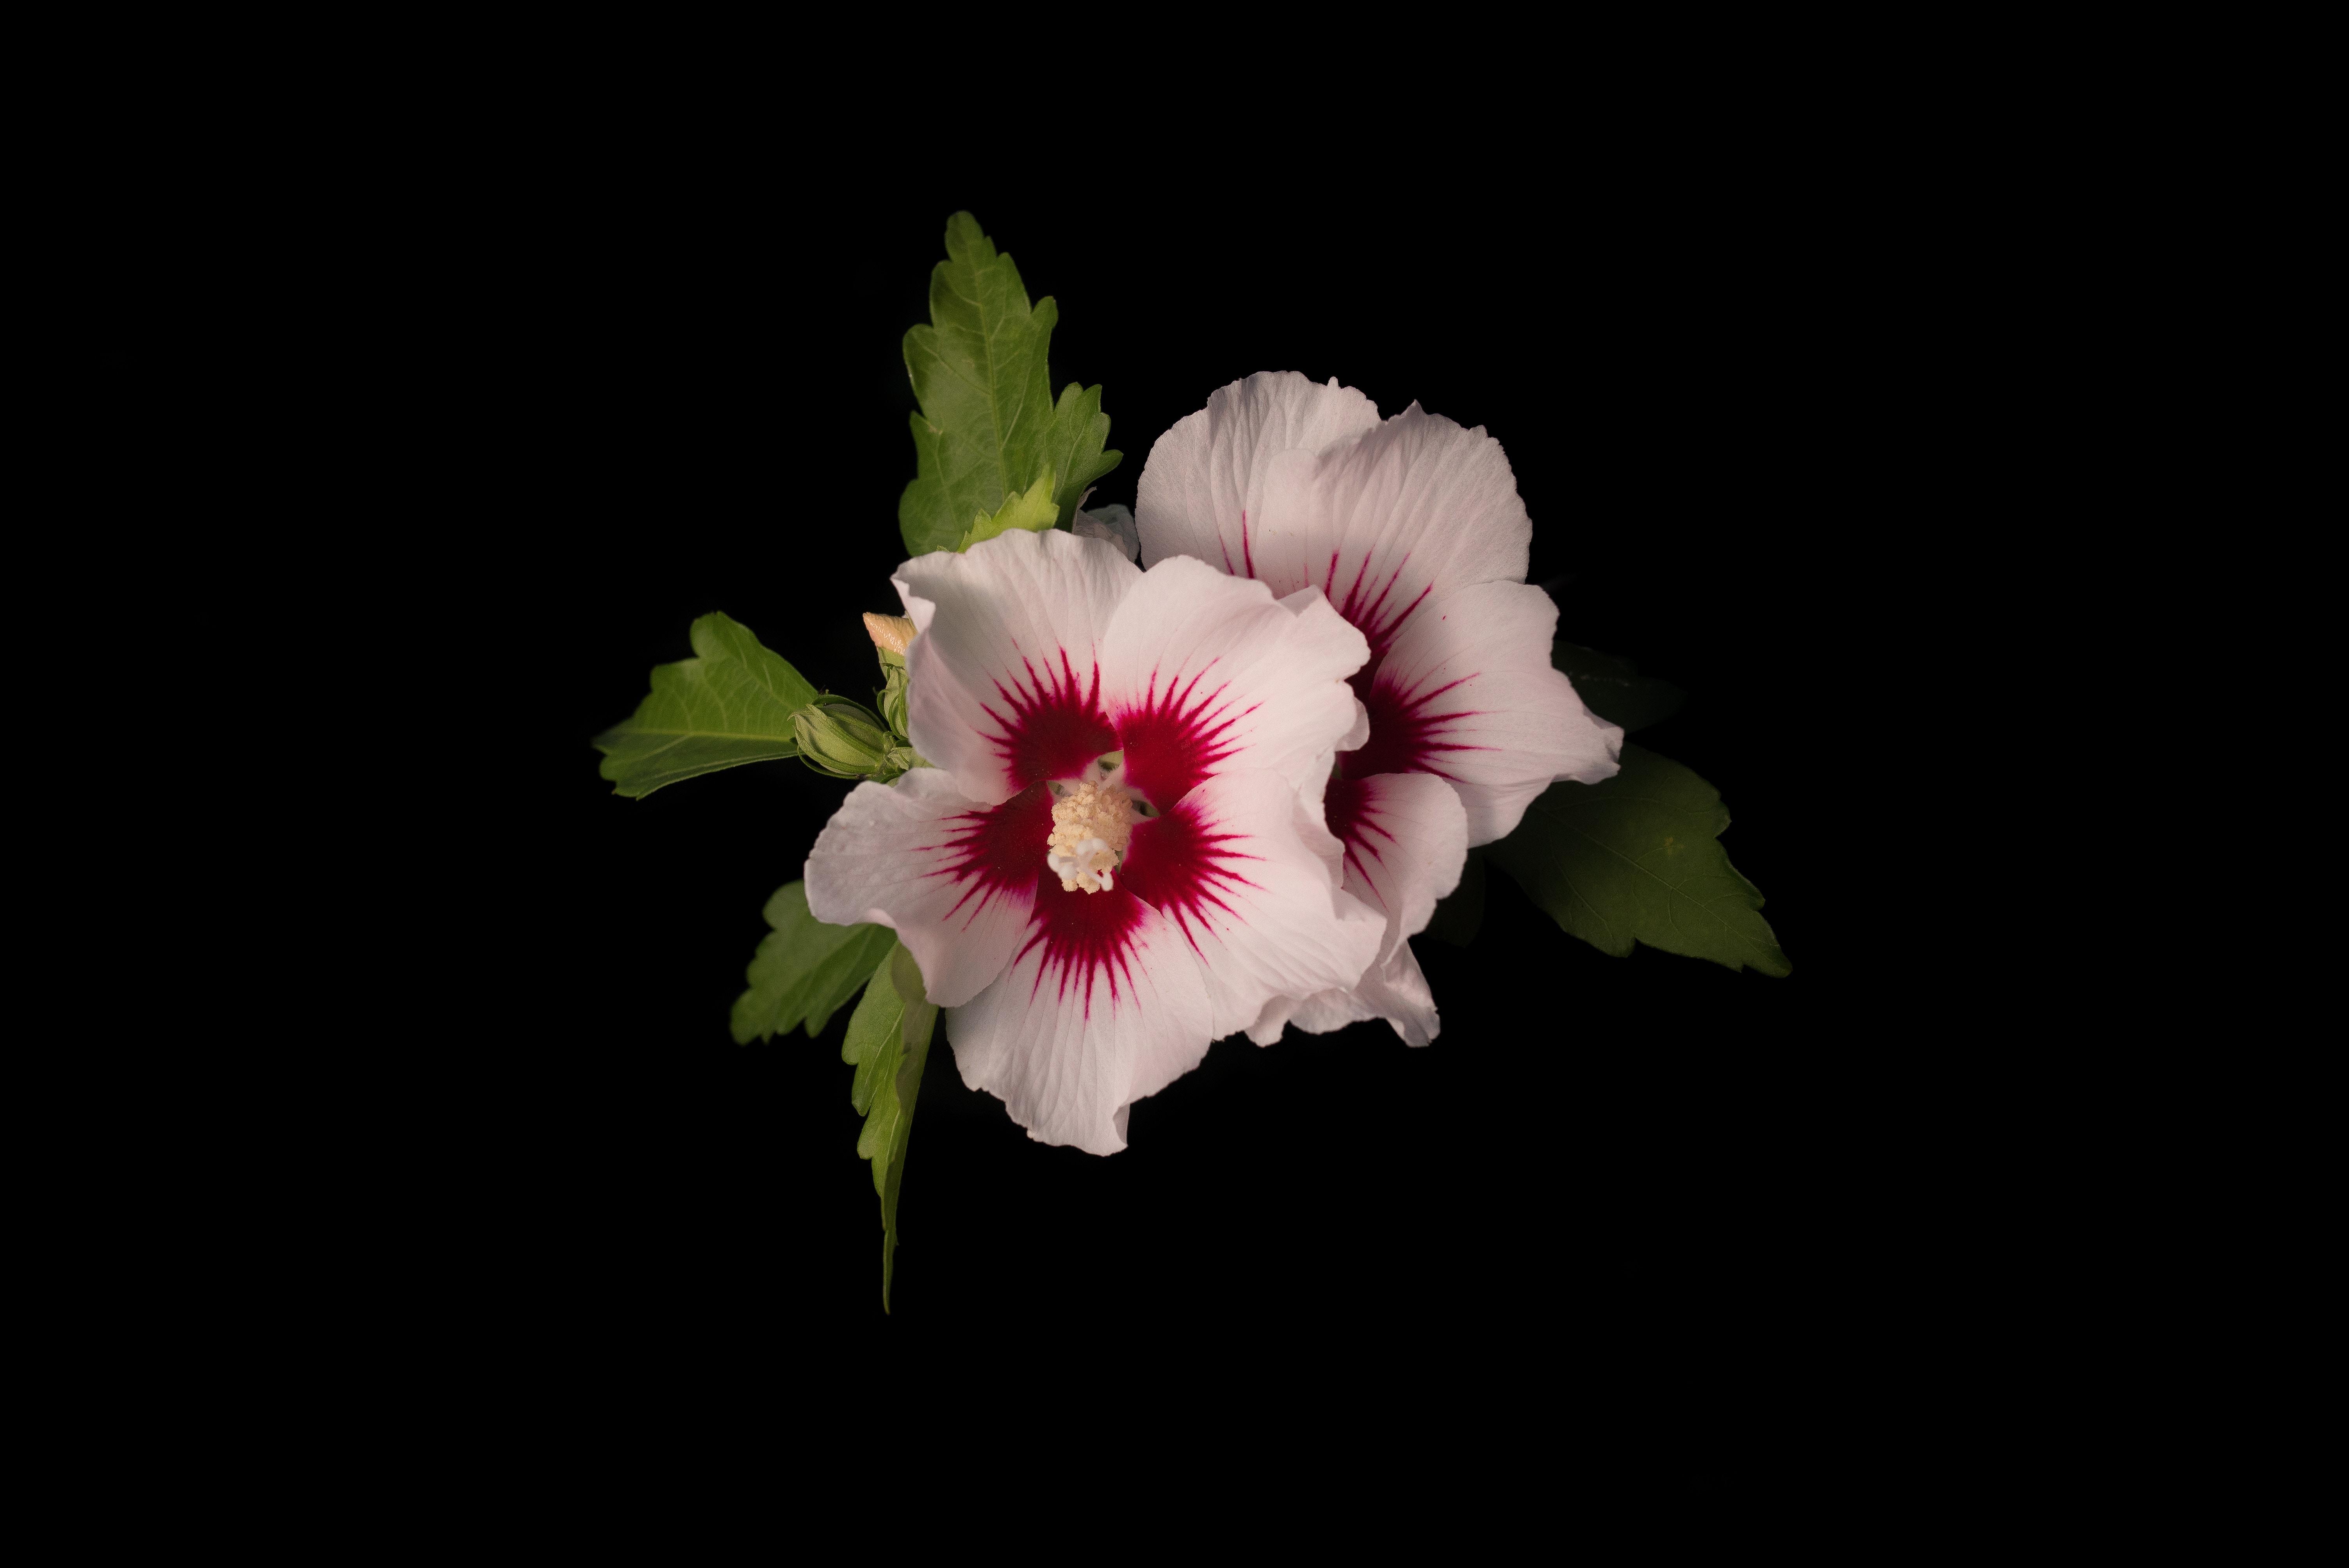 Free Images Flower Petal Pink Flora Malvales Flowering Plant